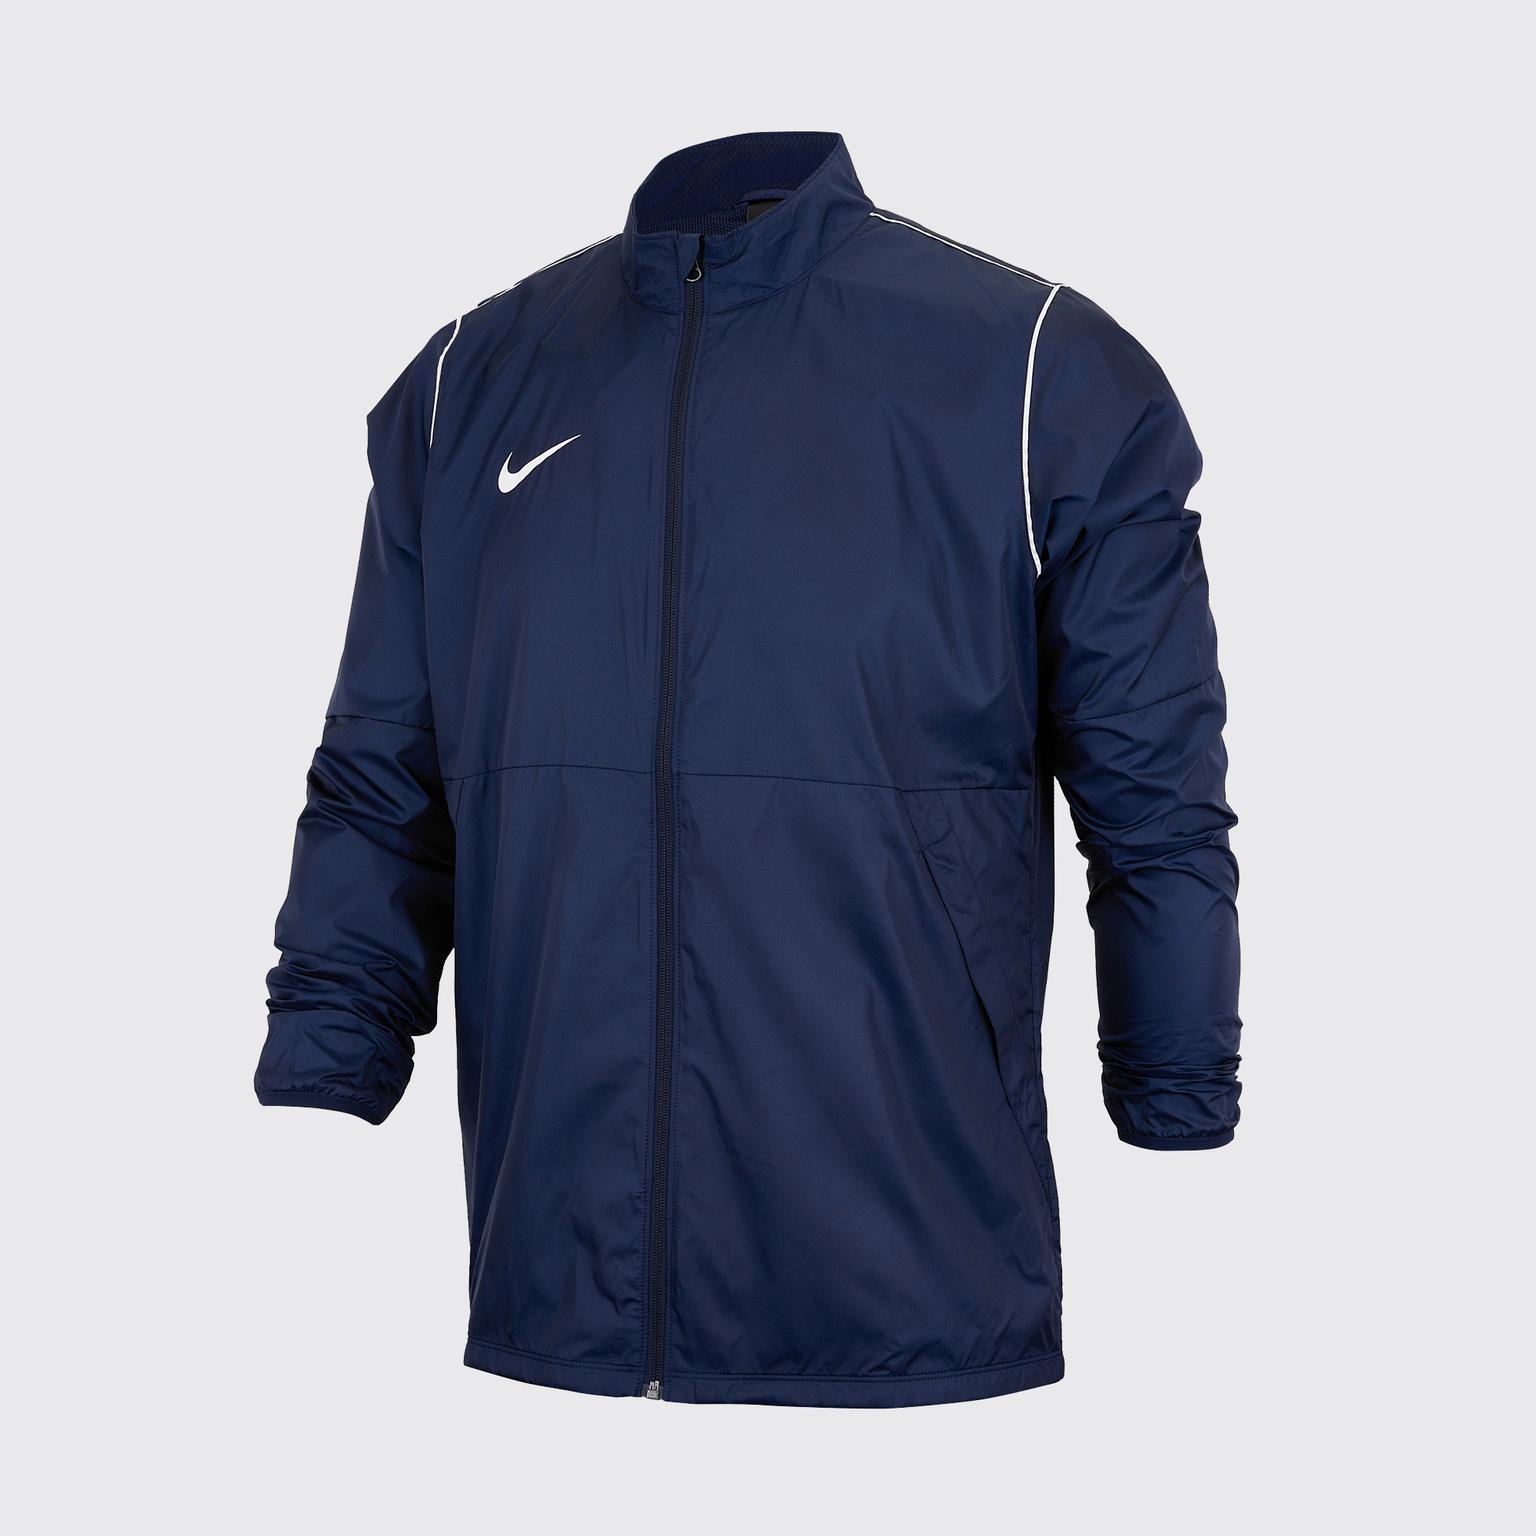 цена Ветровка Nike RPL Park20 Rain Jacket BV6881-410 онлайн в 2017 году